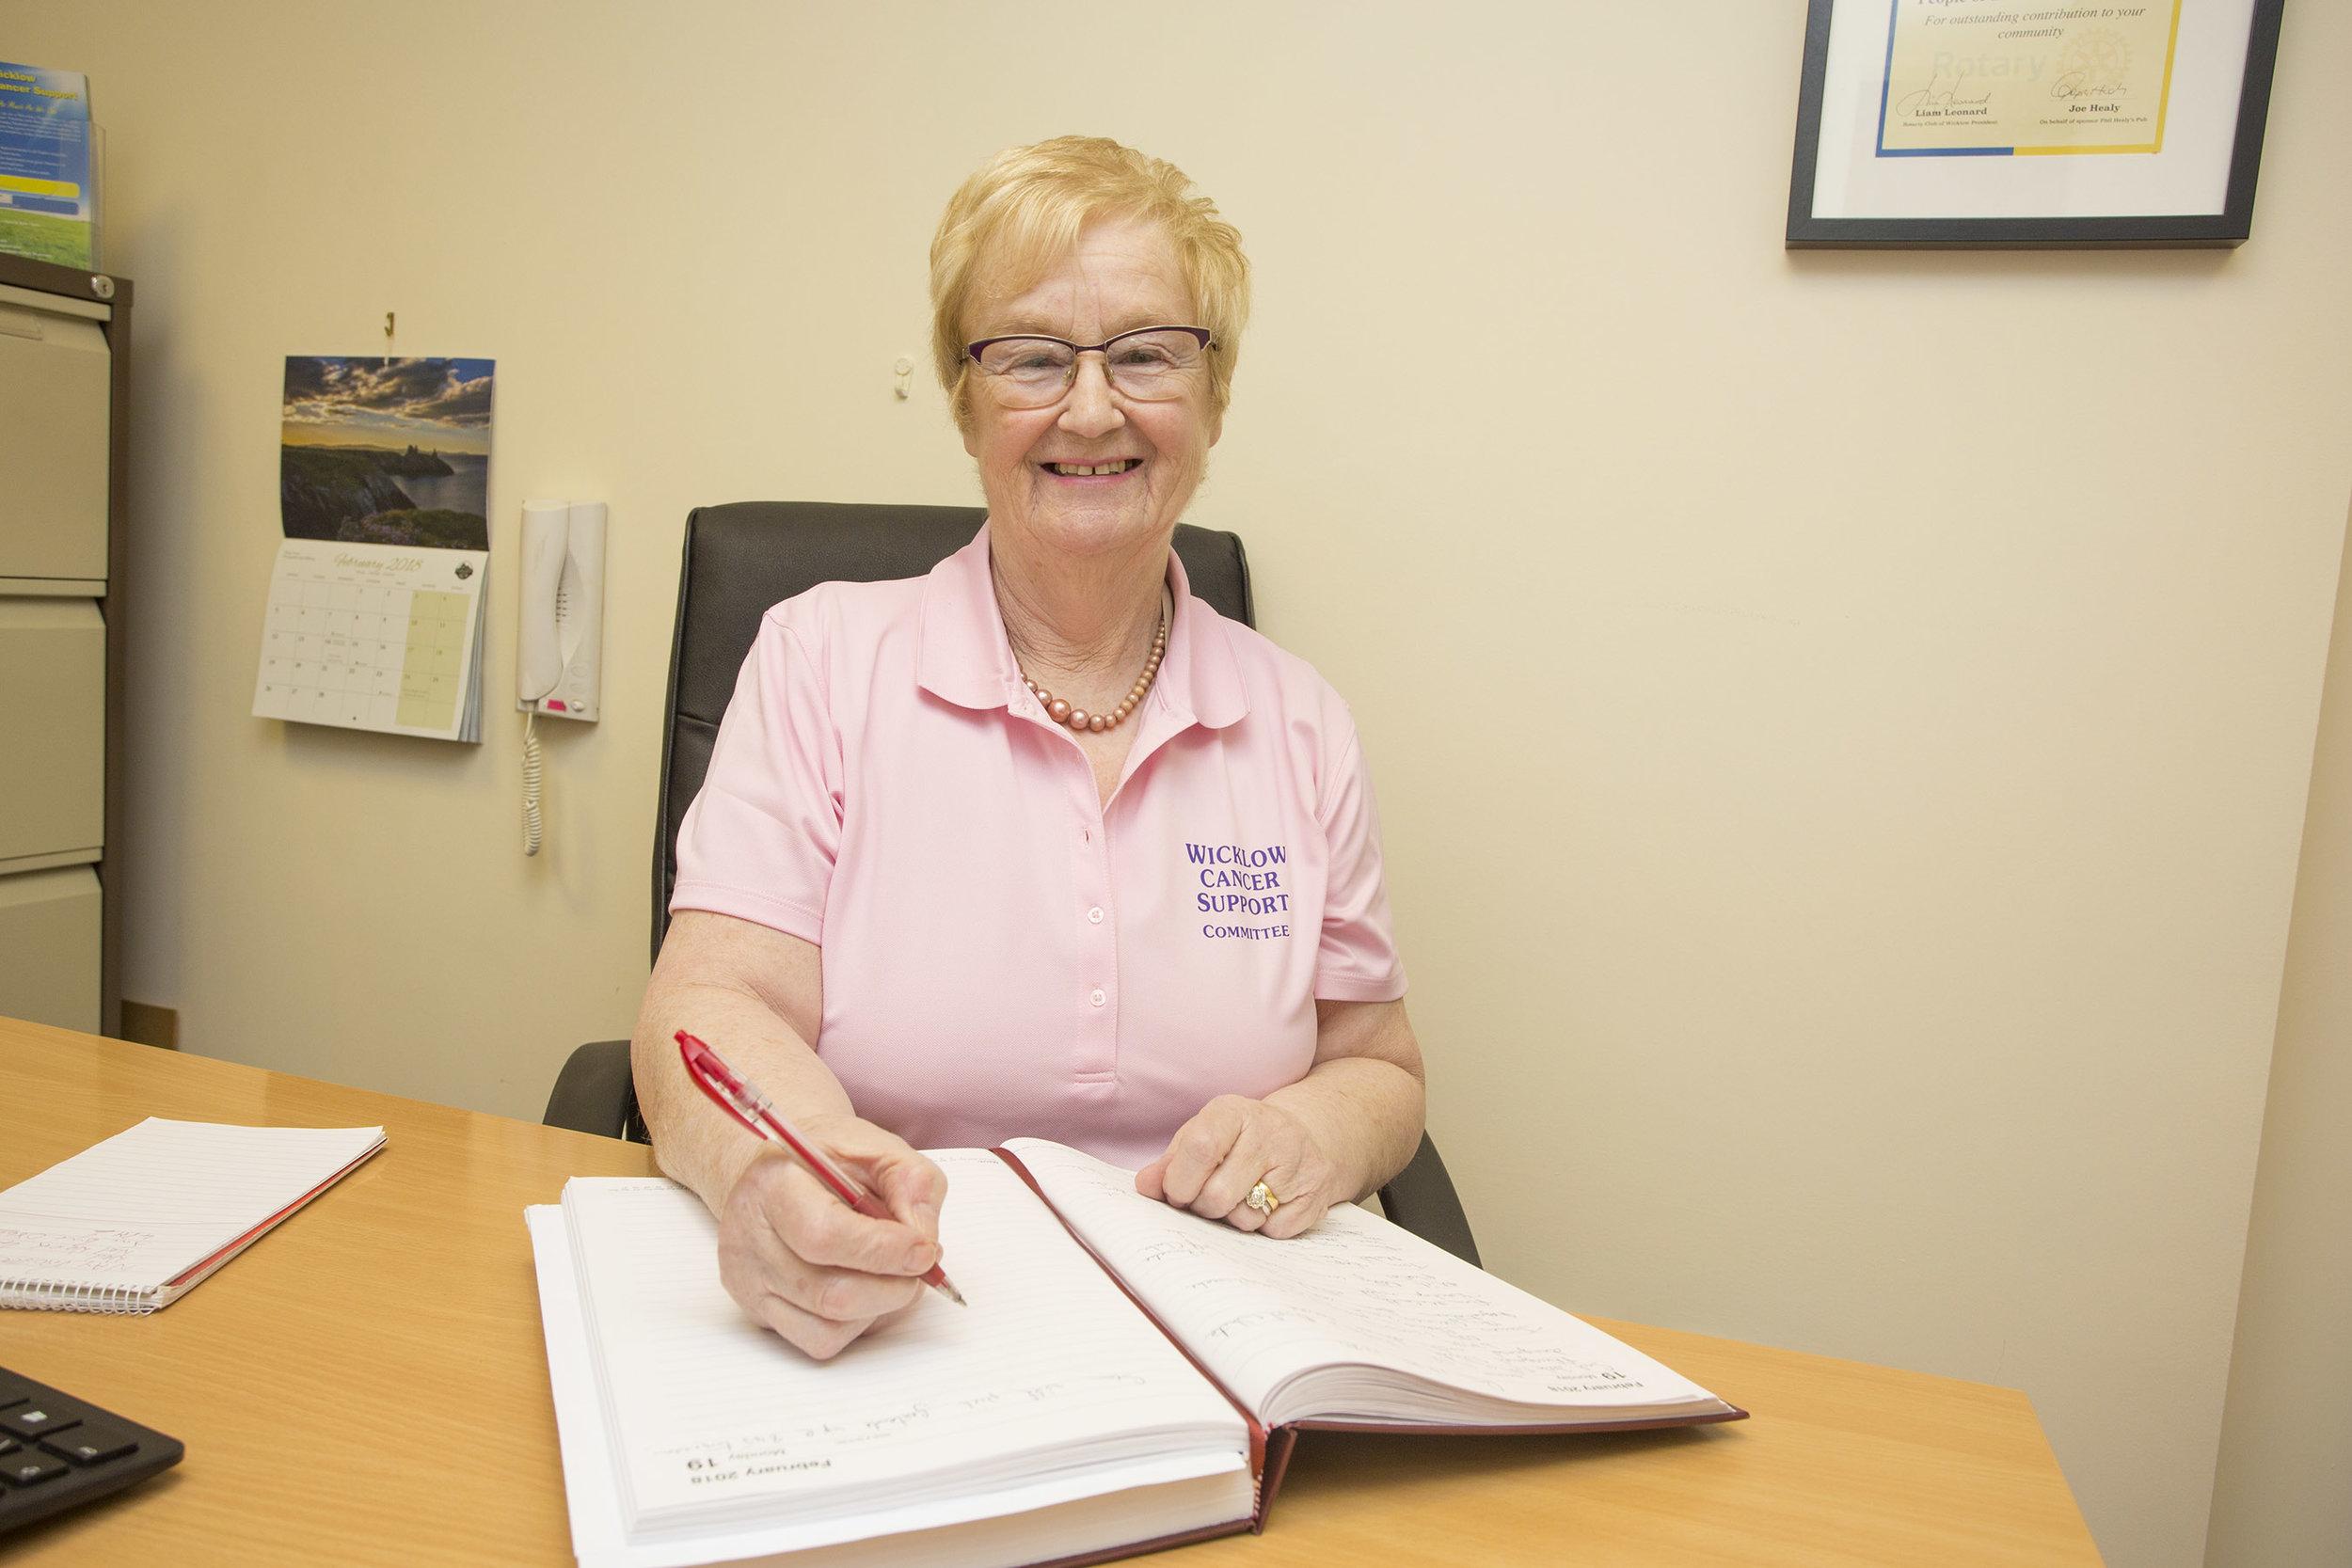 Eileen Earls, Chairperson